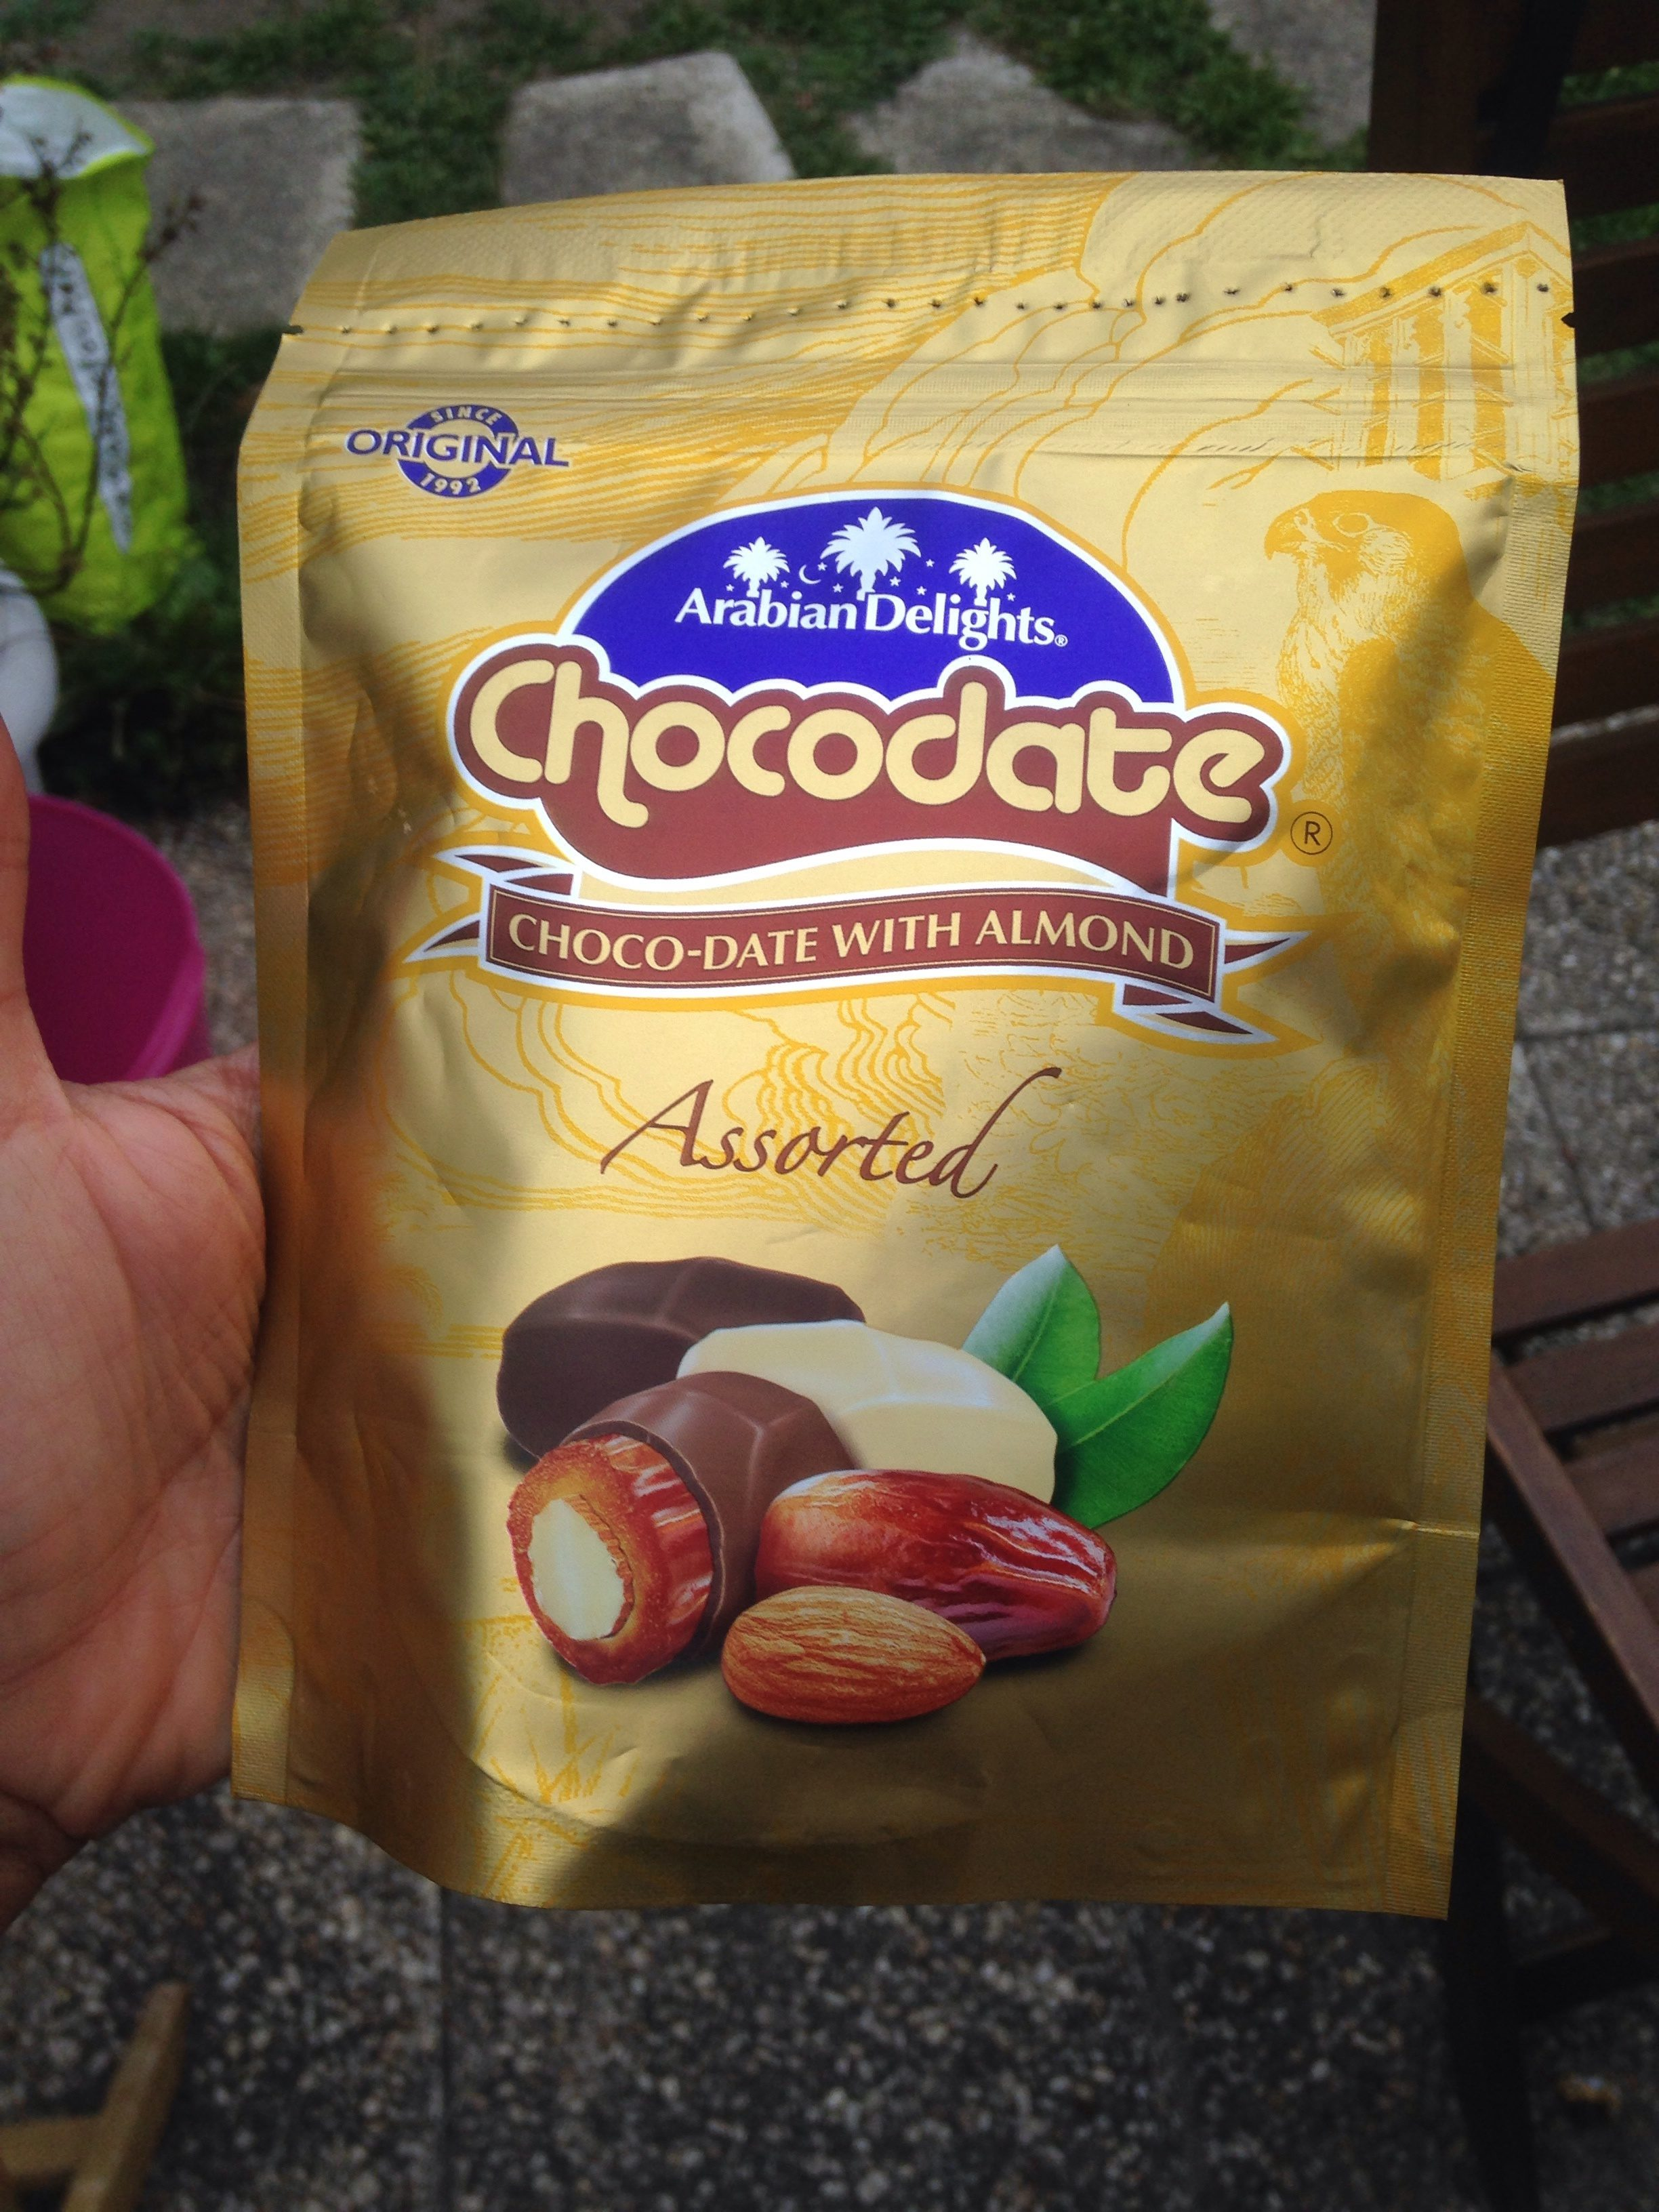 Chocodate Choco-date With Almond (90 G) - Ingrédients